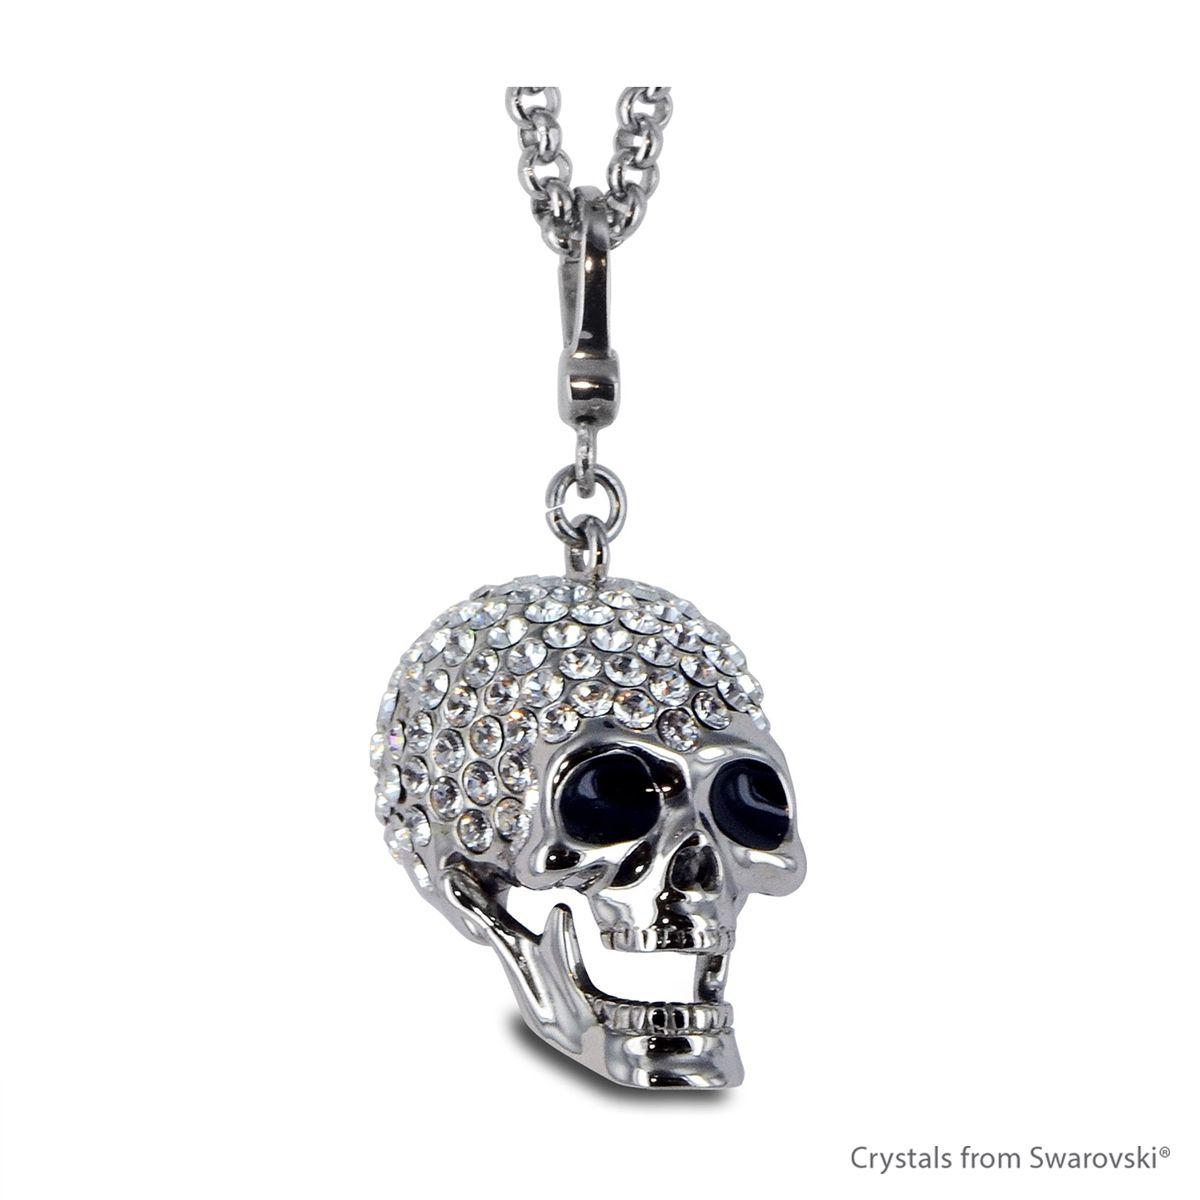 Swarovski skull skull necklace embellished with swarovski swarovski skull skull necklace embellished with swarovski crystals mozeypictures Images